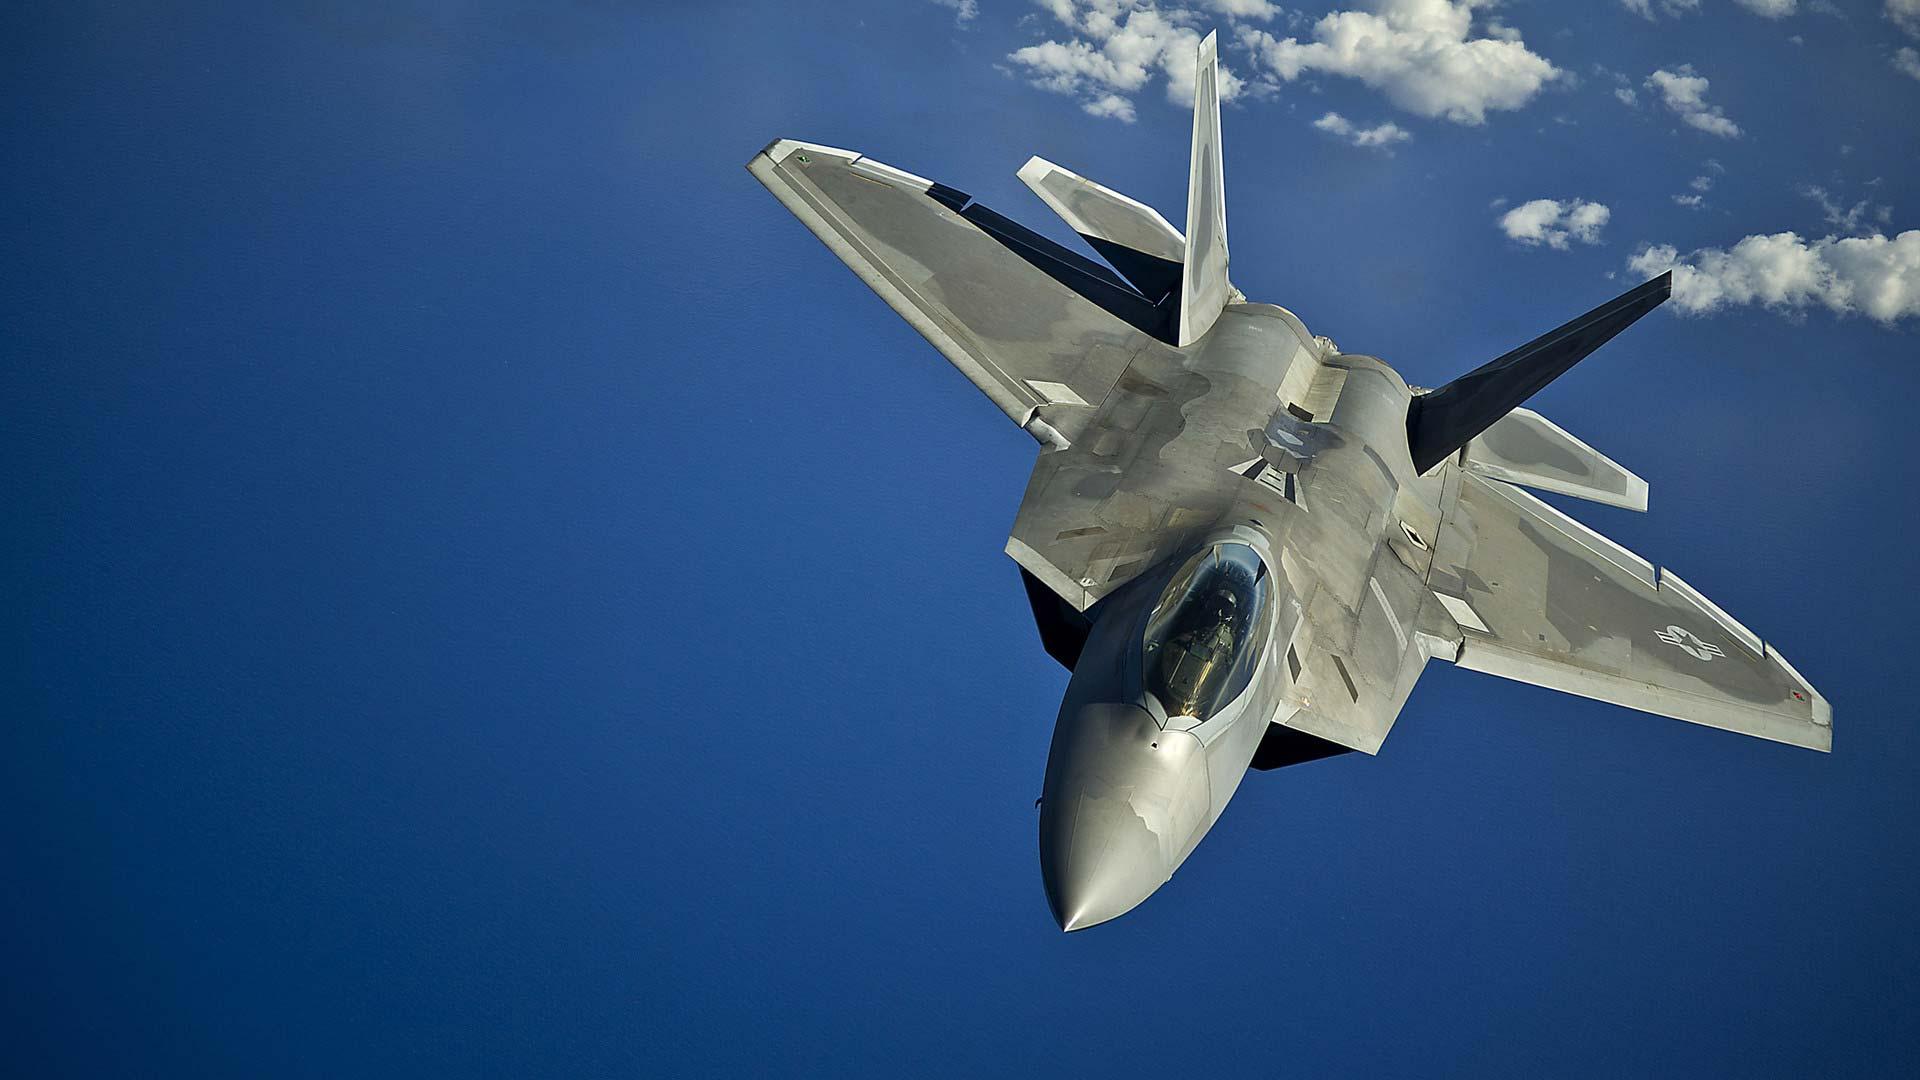 Impresión 3D metálica en cazas F-22 Raptor